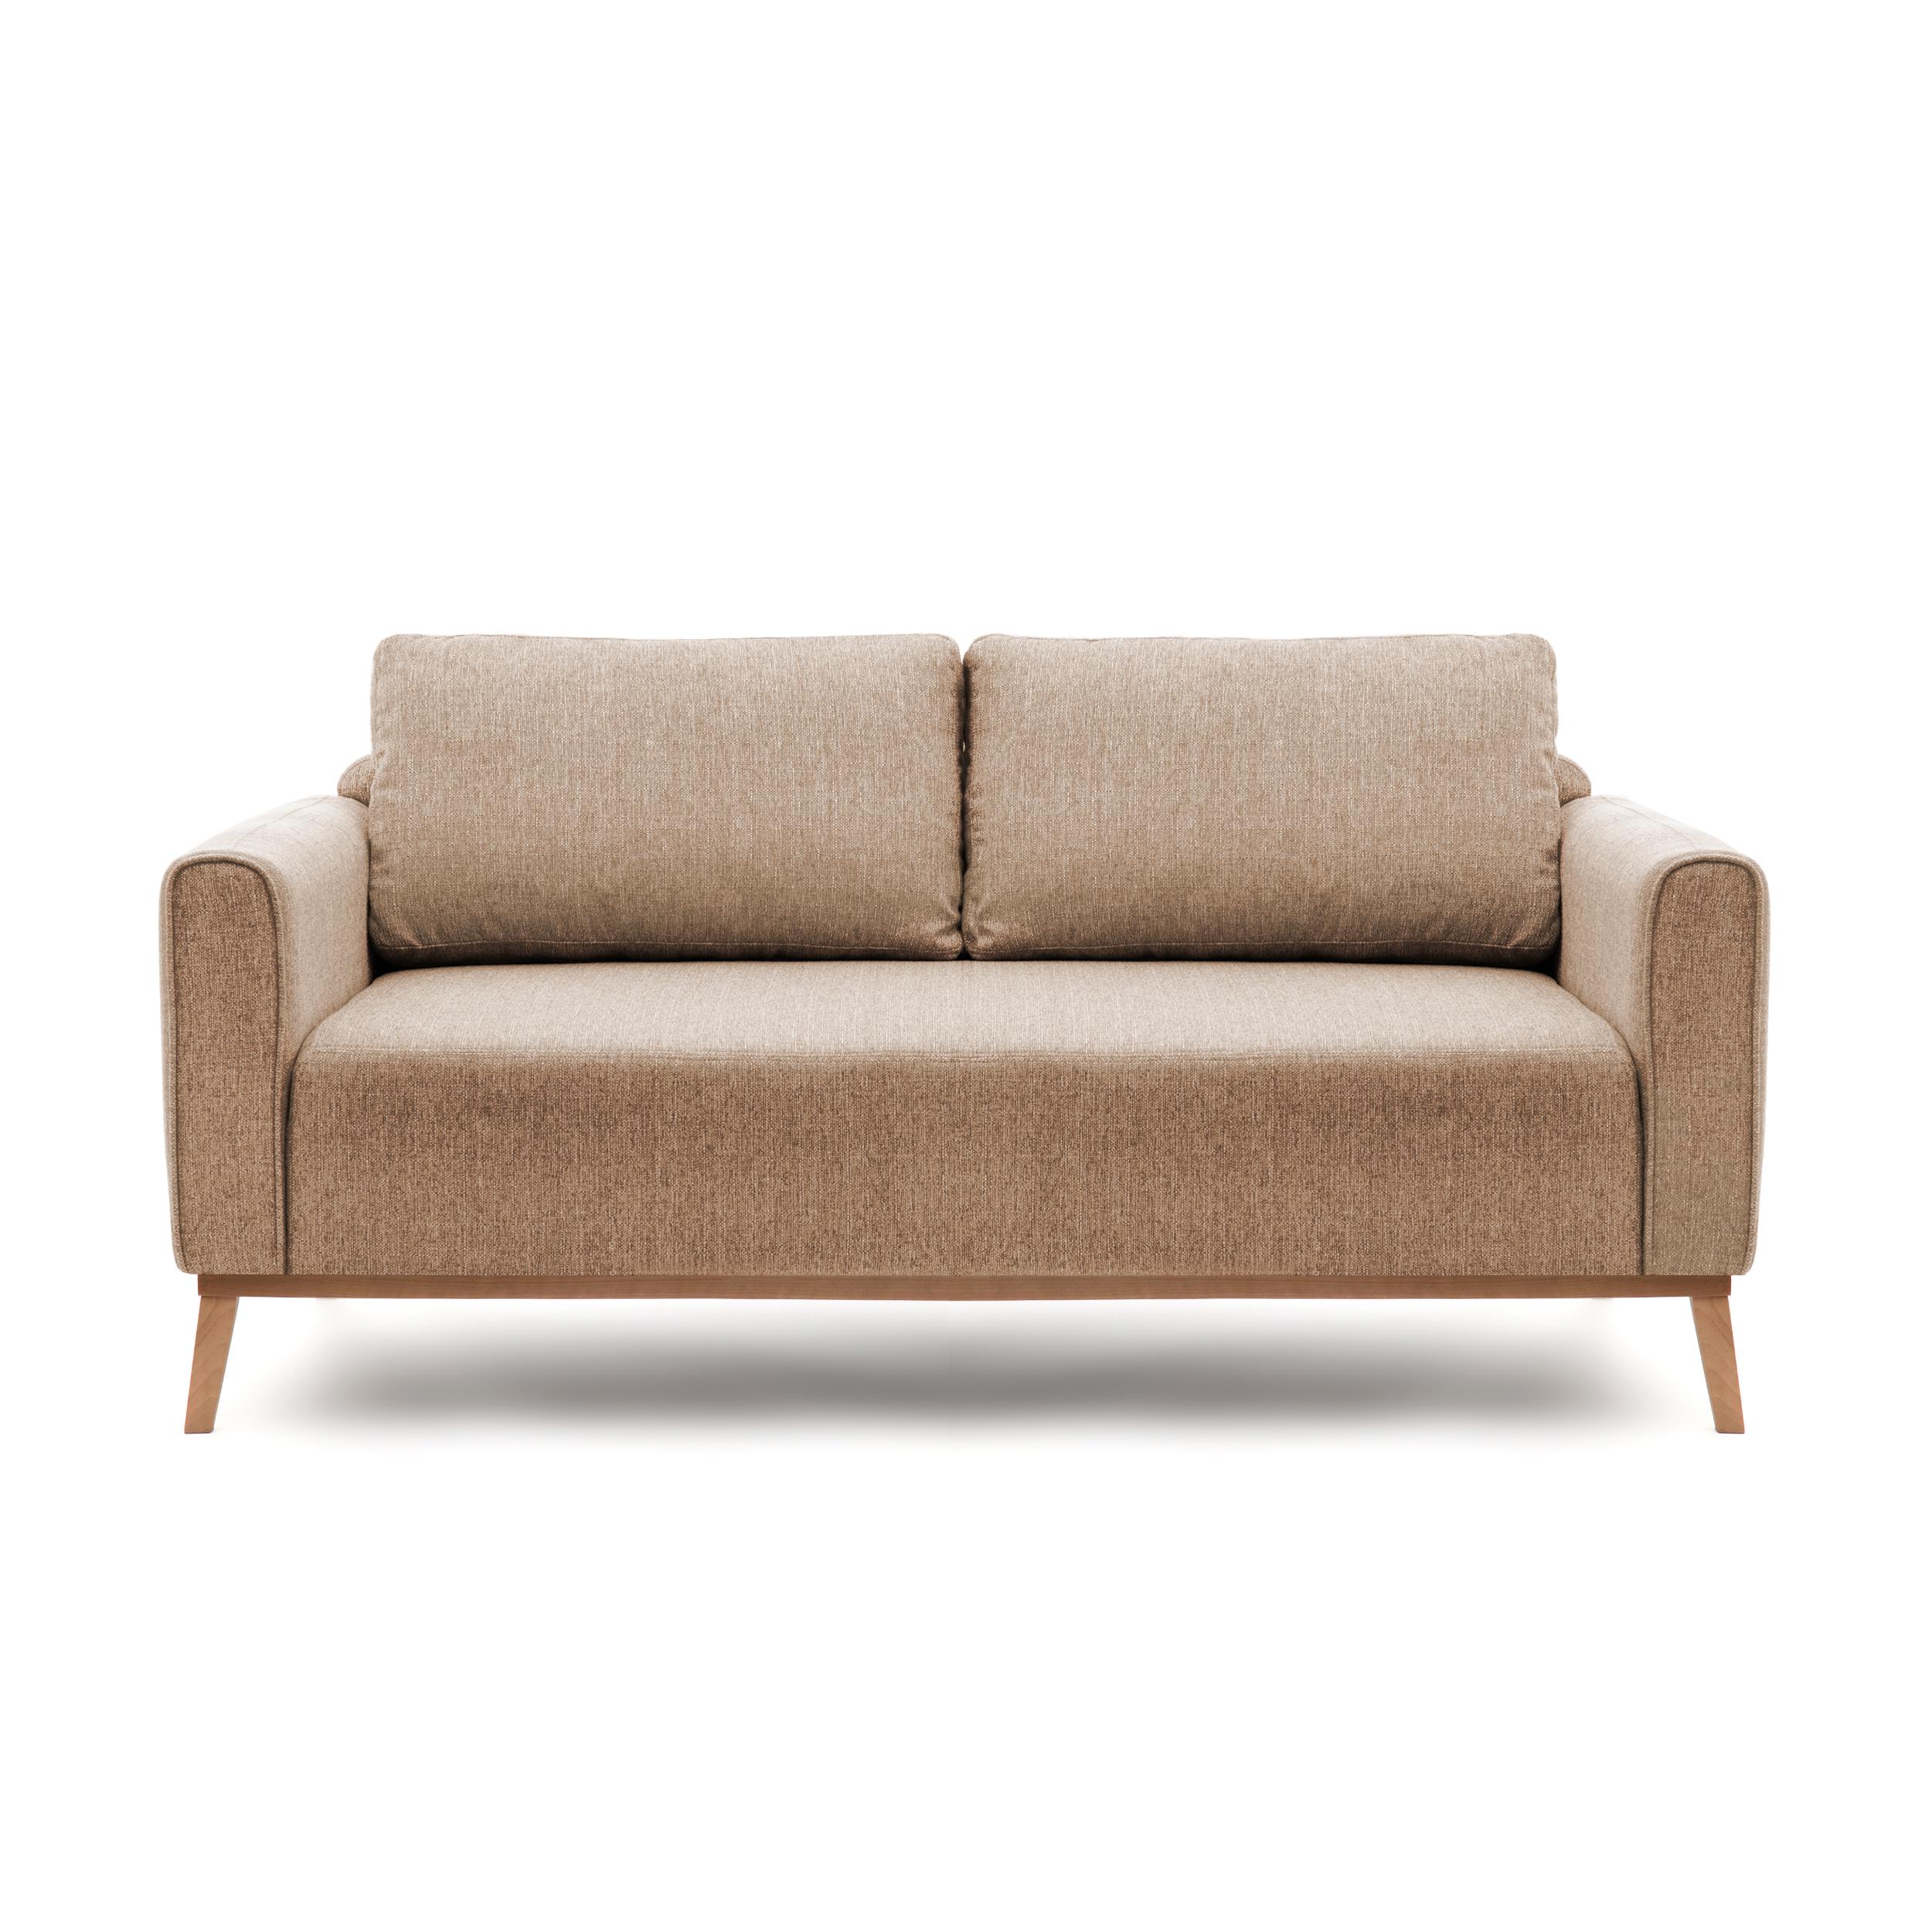 Canapea Fixa 3 locuri Milton Sand